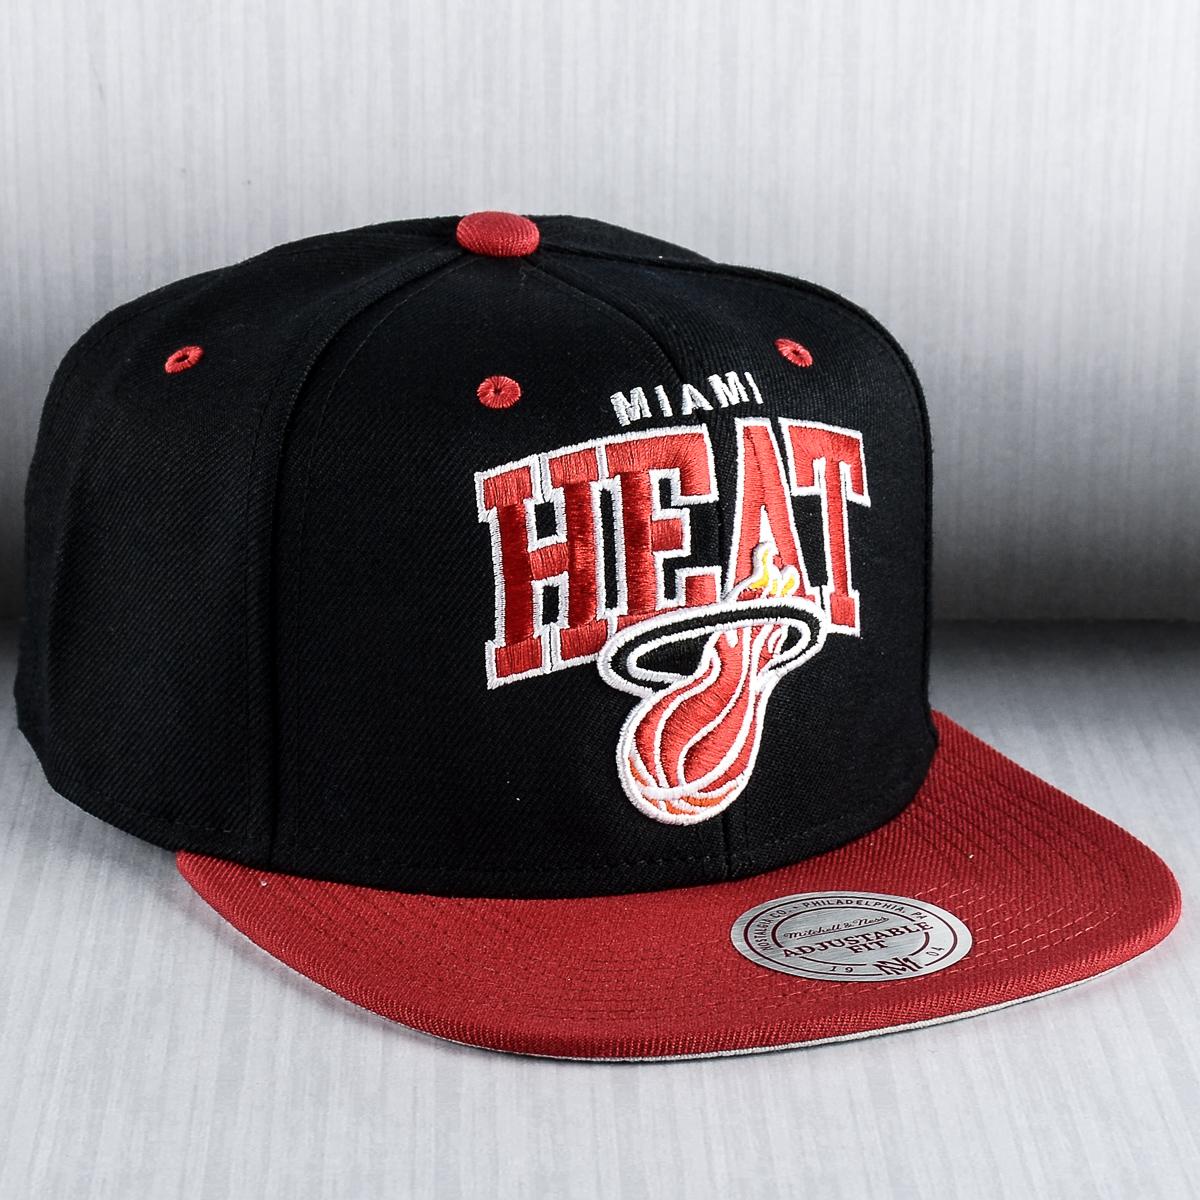 new arrival 6f810 8899e Mitchell   Ness NBA Miami Heat Team Arch Snapback Cap - NBA Shop Miami Heat  Merchandise - Superfanas.lt